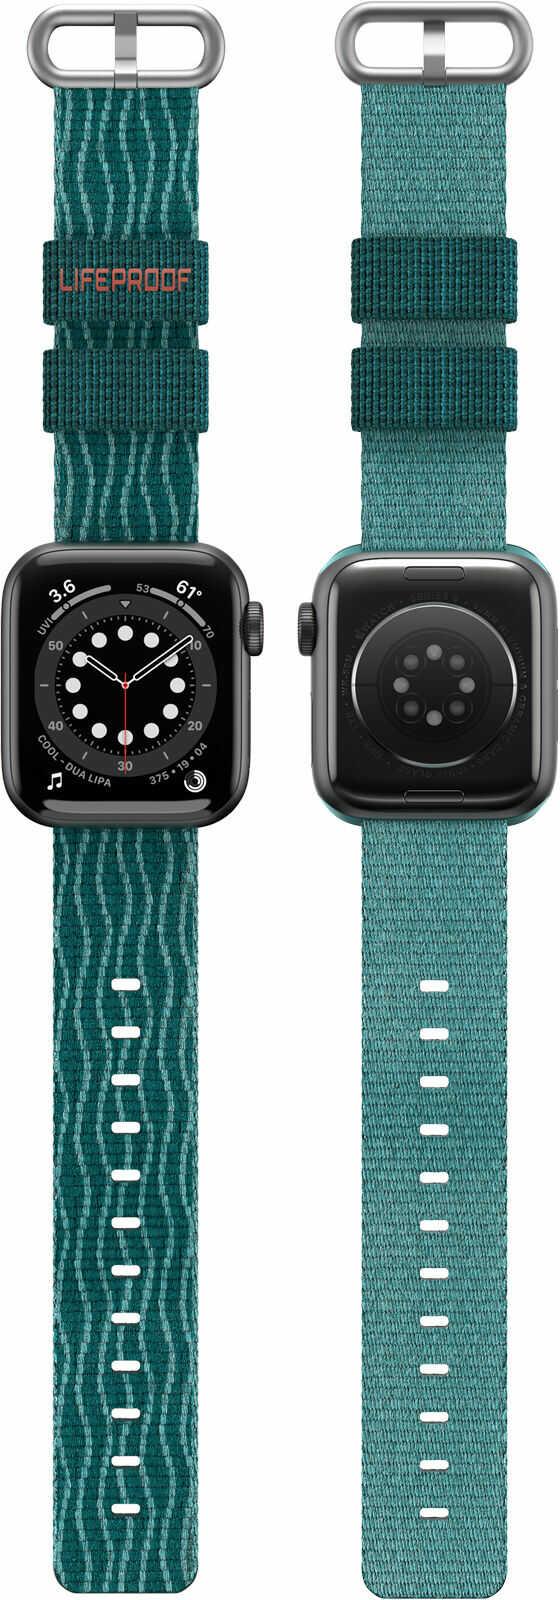 LifeProof Eco-Friendly Pasek Materiałowy do Apple Watch (45 mm) / Apple Watch (44 mm) / Apple Watch (42 mm) (Under The Sea)